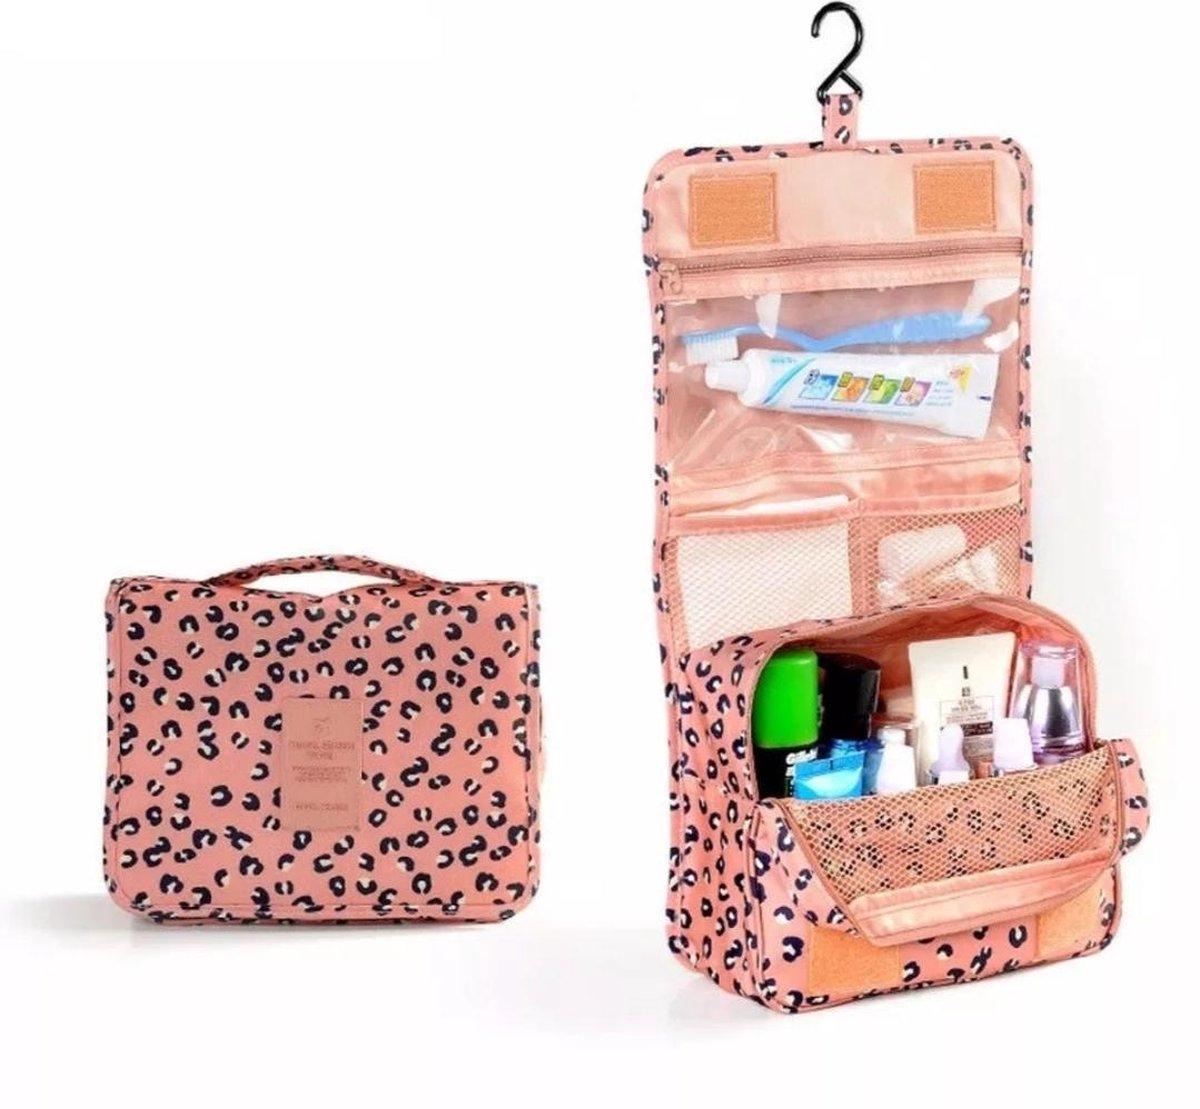 Toilettas met Haak - Roze met Luipaardprint - Beautycase - Organizer - Reistas - Uitklapbare Toilett